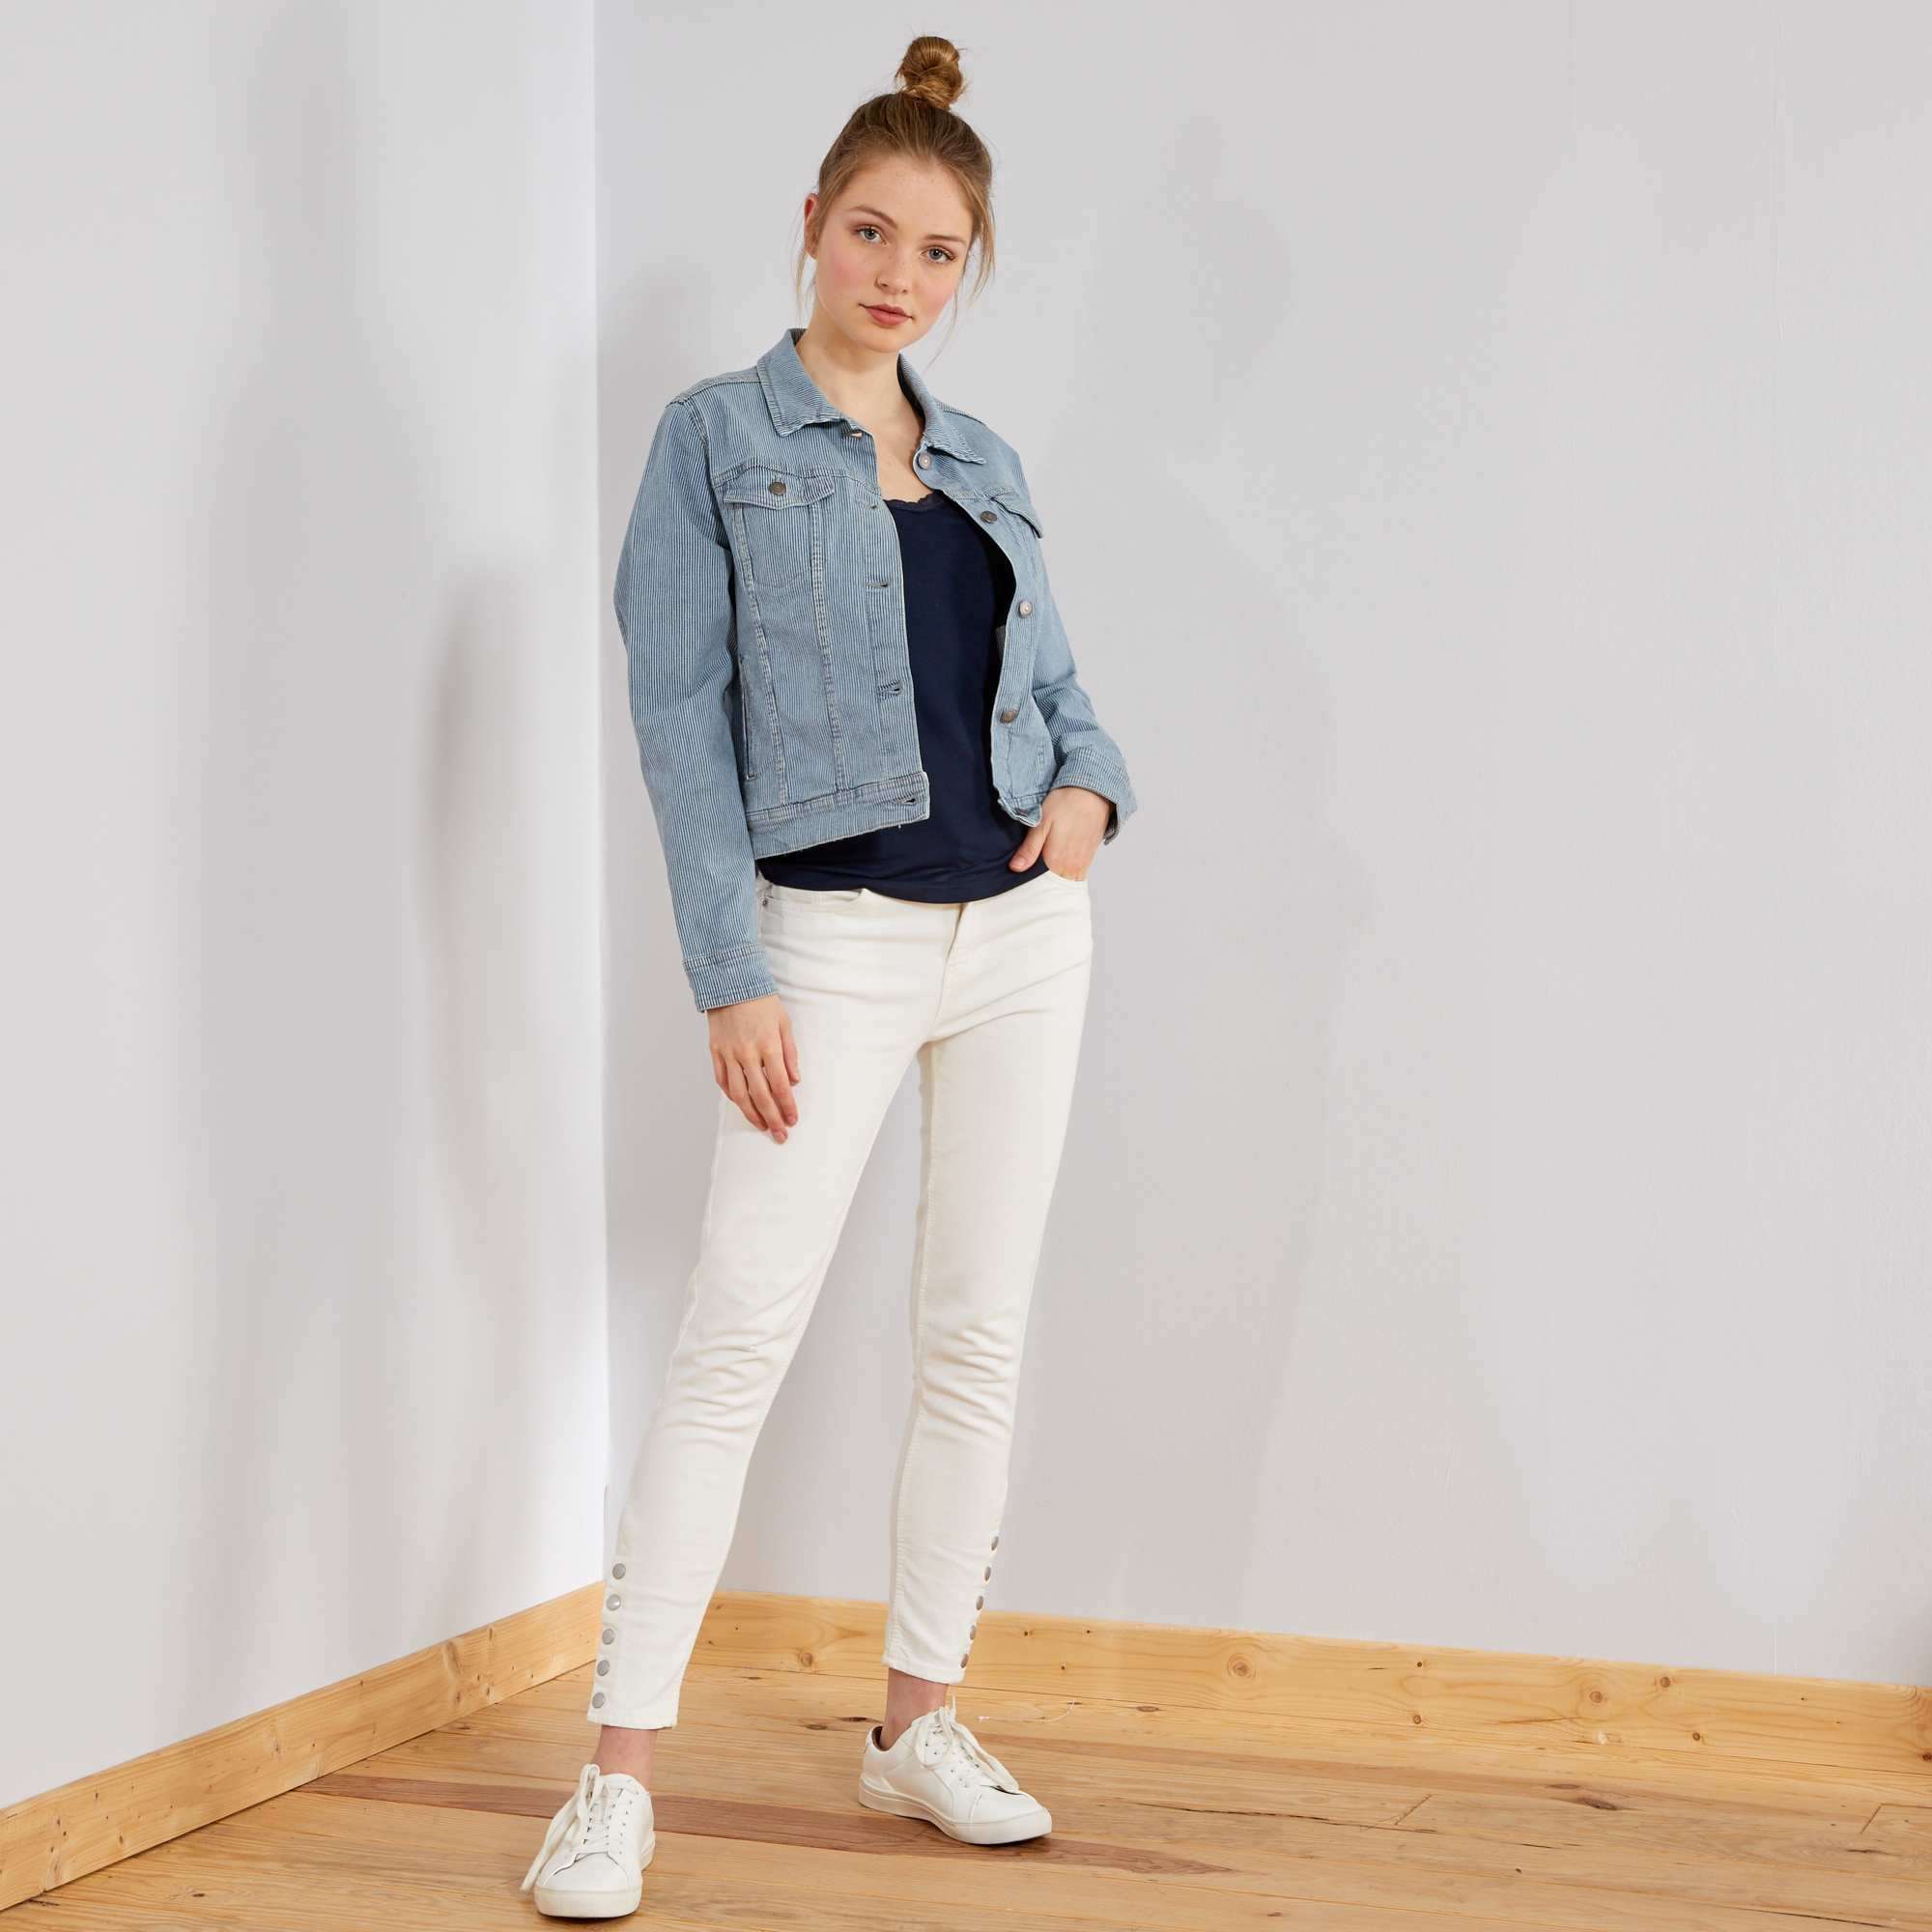 Merveilleux Pantalon Skinny Taille Haute Blanc Femme. Loading Zoom